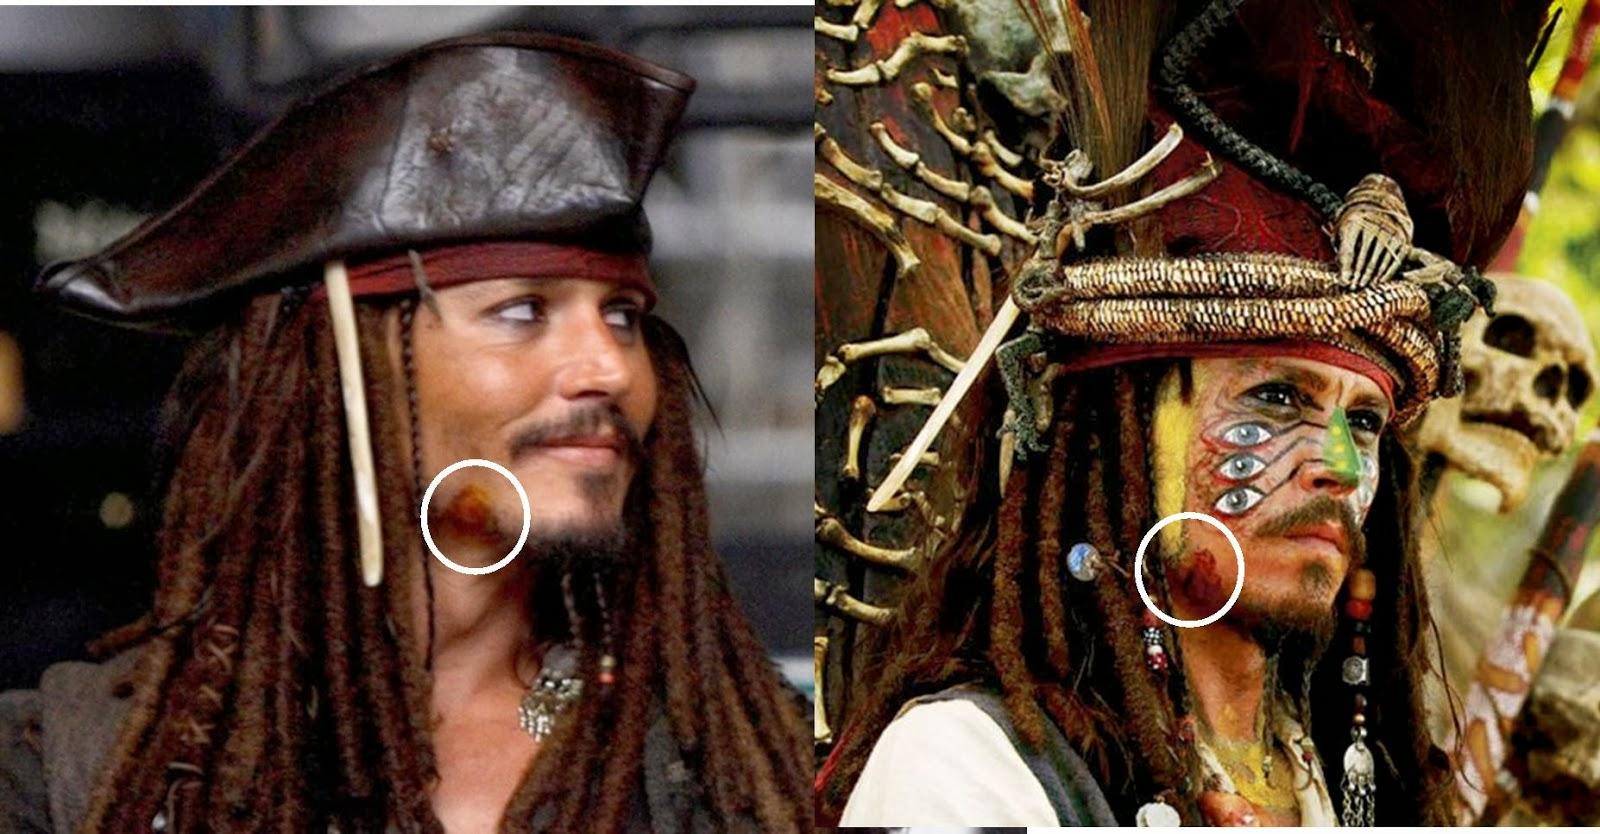 Jack Sparrow Eye Makeup - photo#31